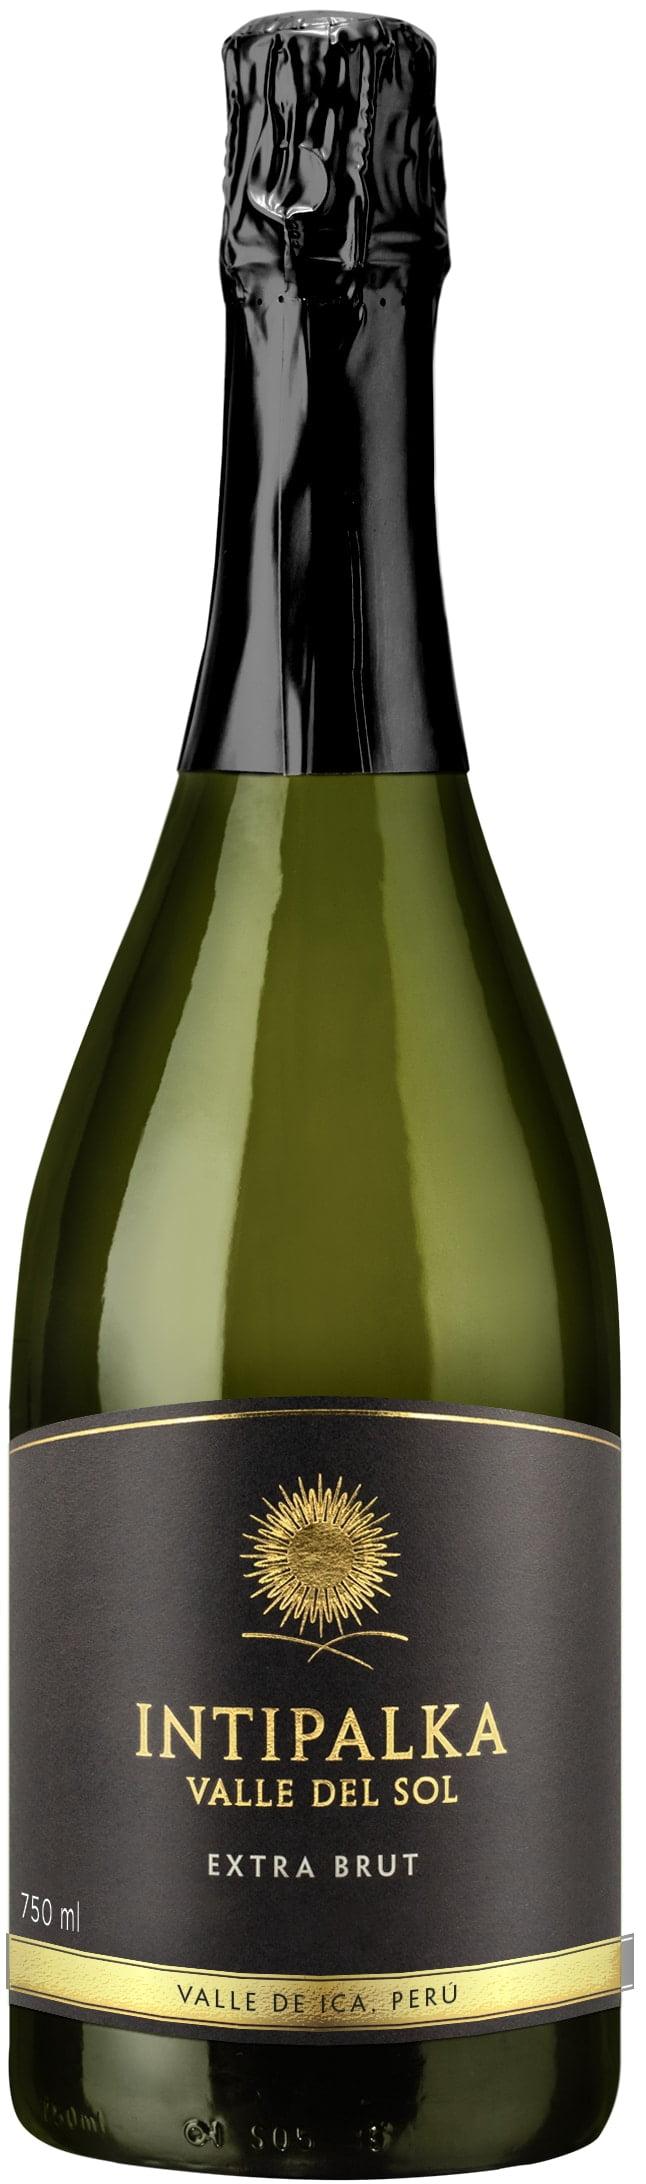 Intipalka – Extra Brut   Peru   gemaakt van de druif: Chardonnay, Pinot Noir